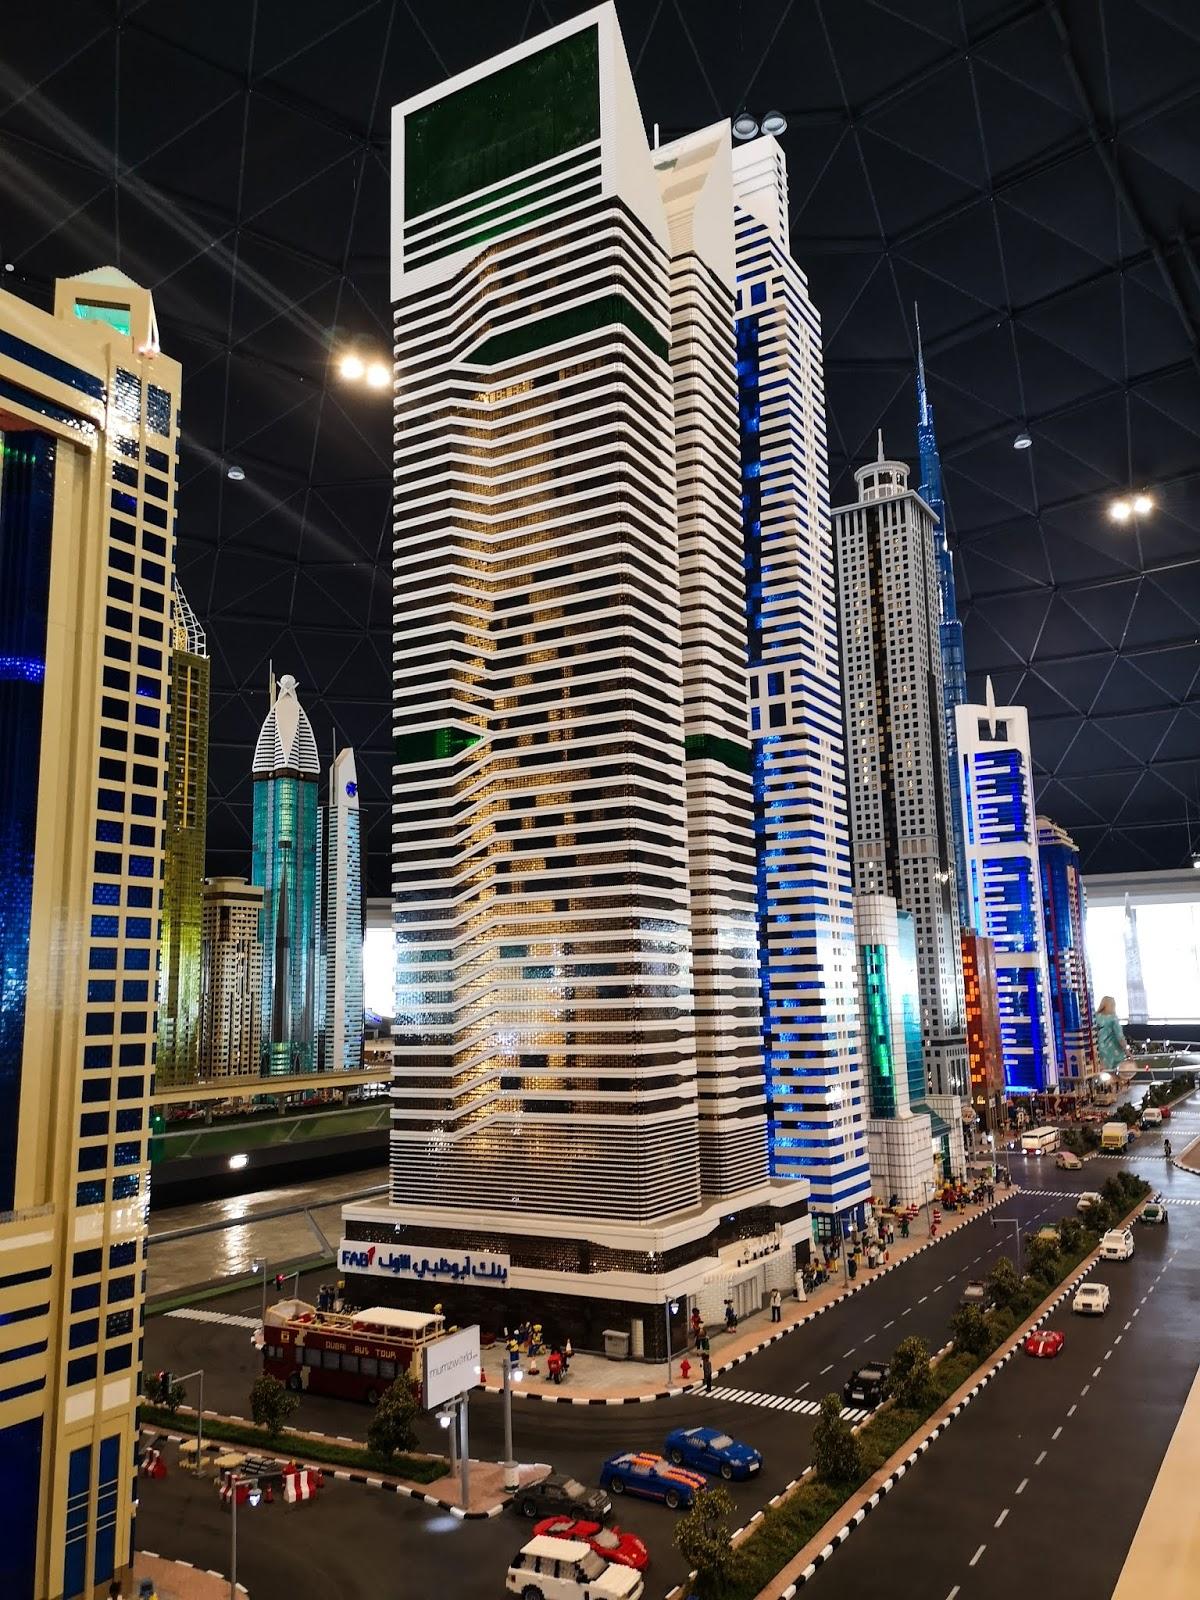 Dubai parks and resorts; #visitdubai #legoland #motiongate #dubaiparks #adventuretime #dubaj #smerfy #legodubaj #lego #legolanddubaj